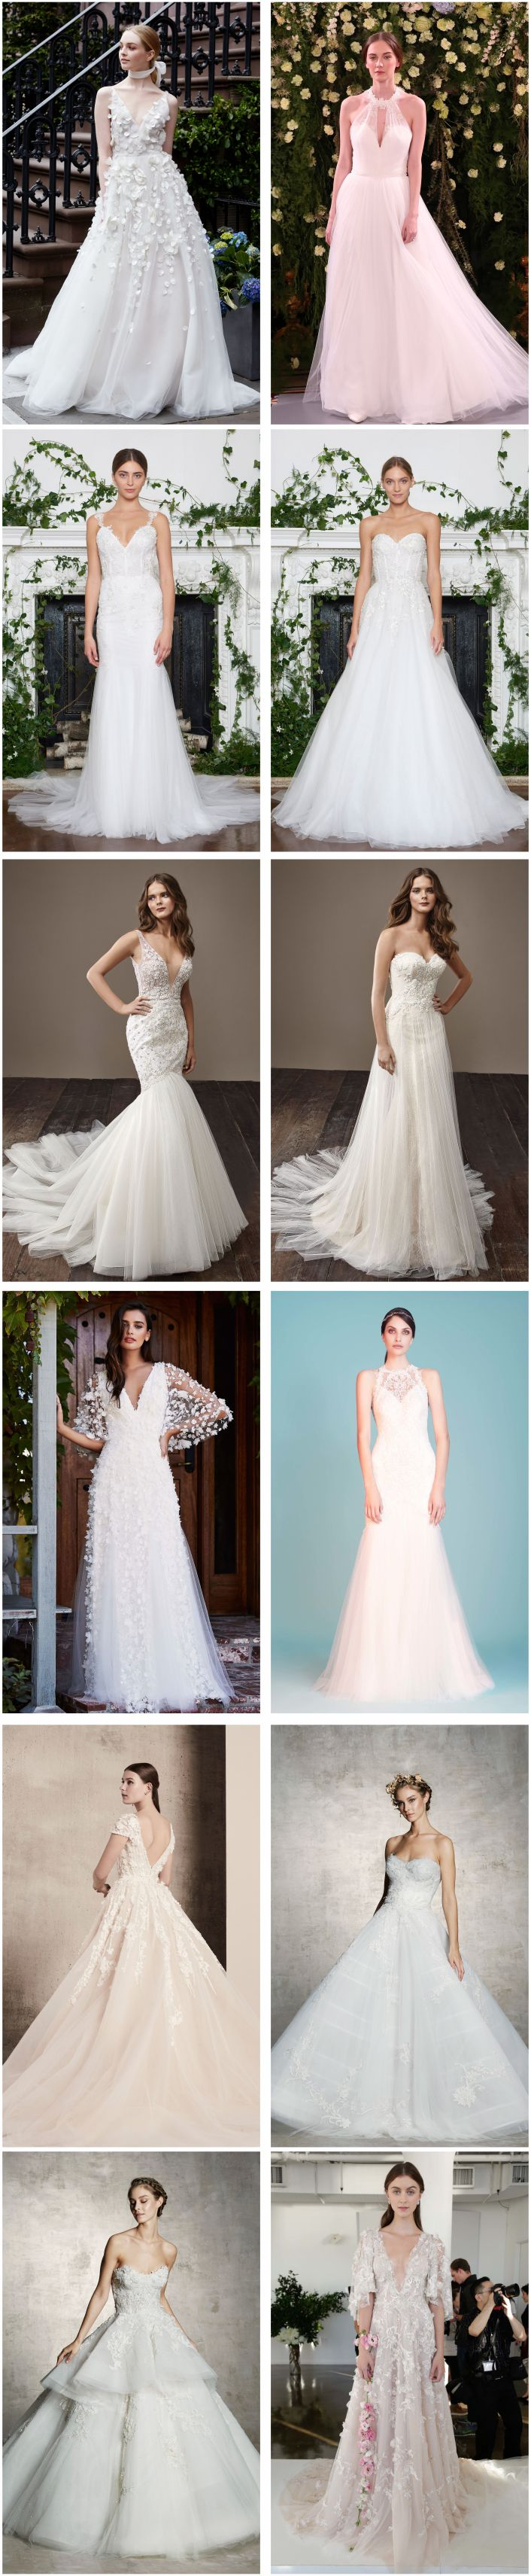 Vestidos de Noiva: Tule